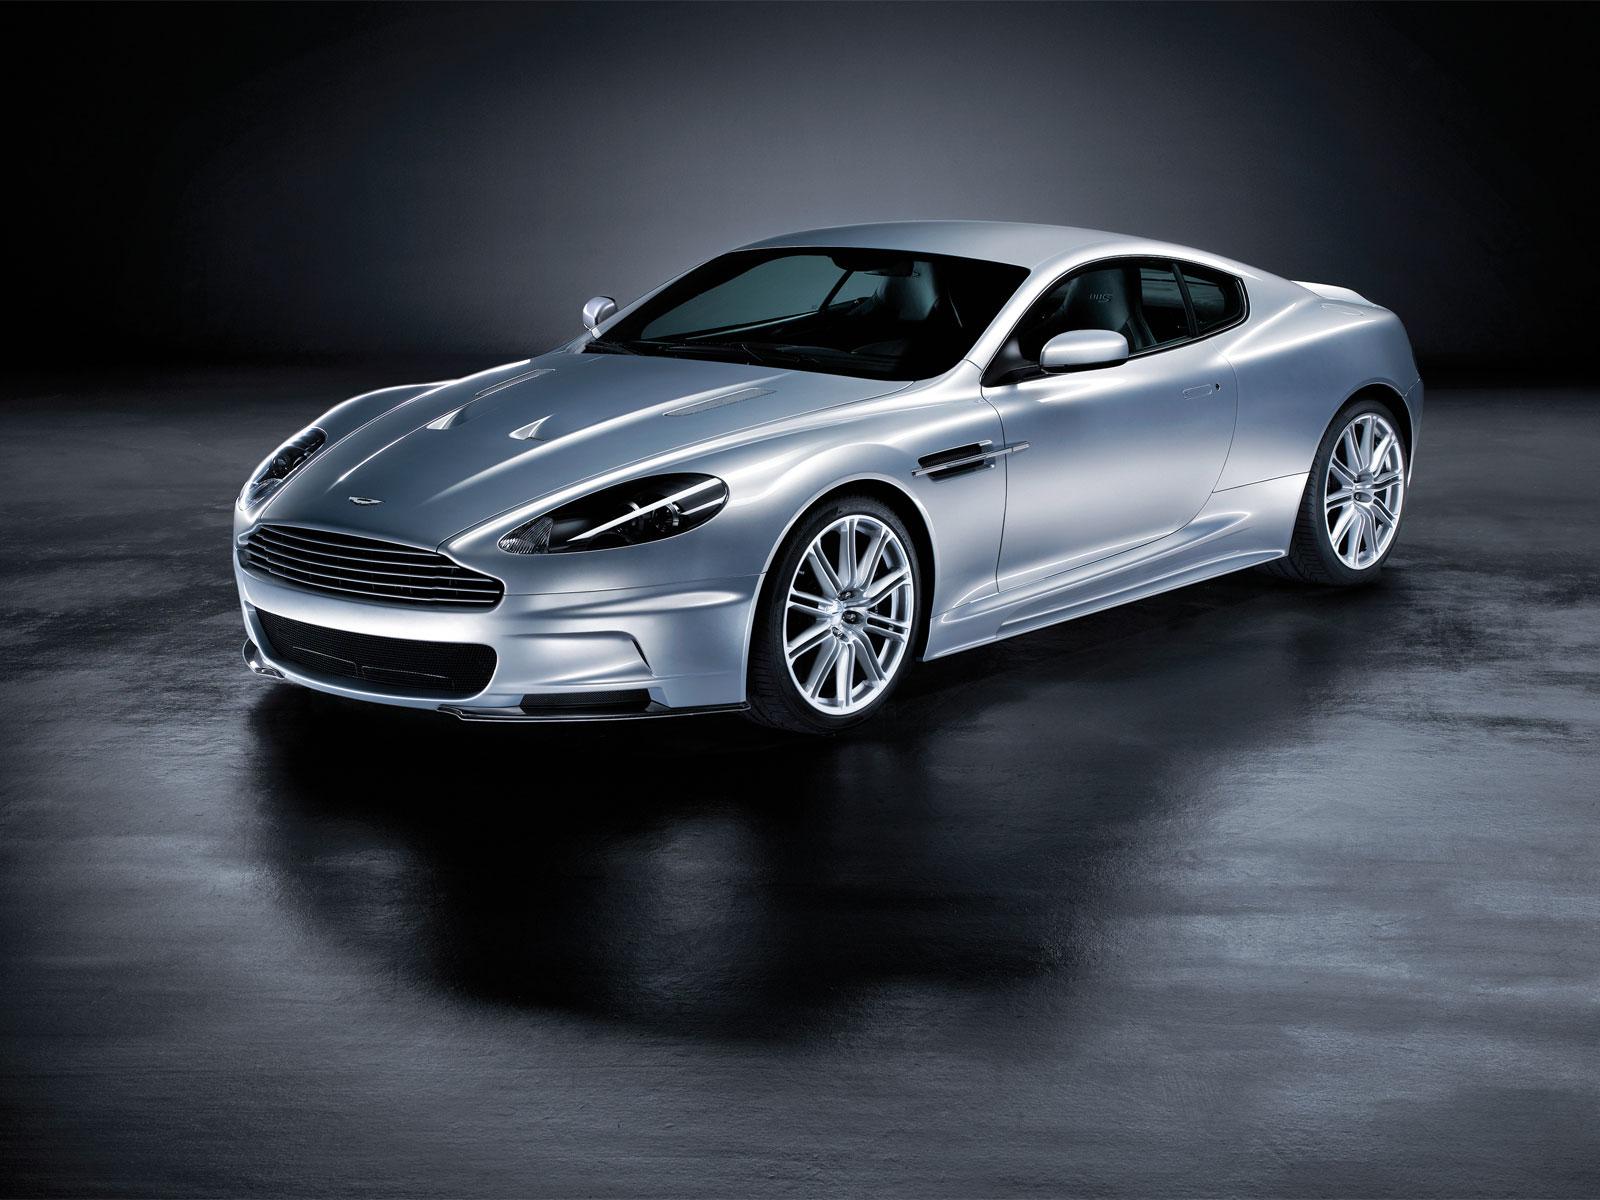 Aston-Martin-DBS